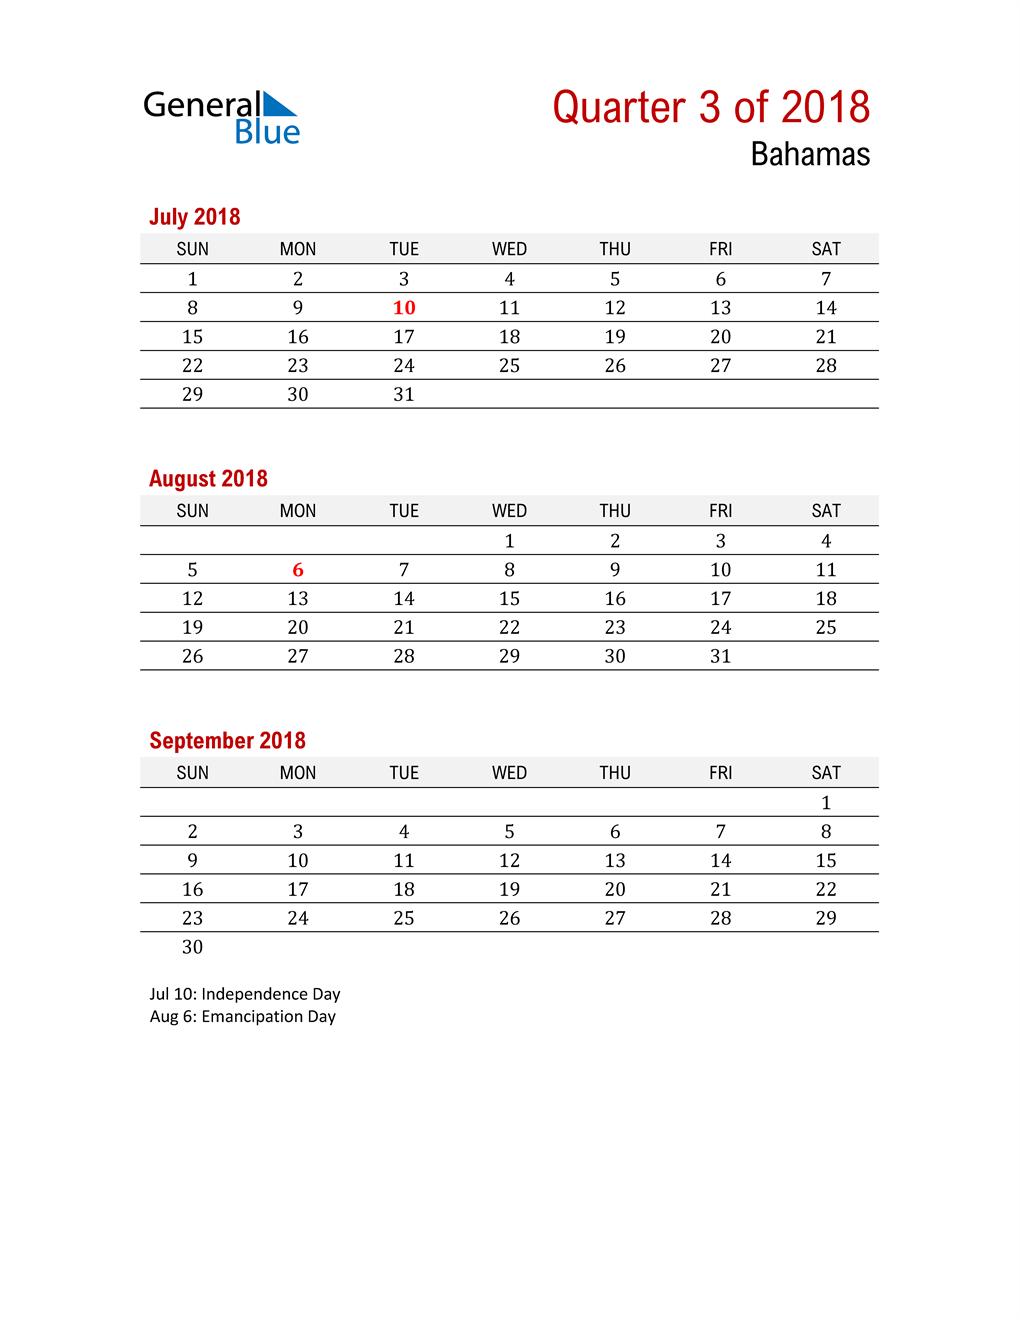 Printable Three Month Calendar for Bahamas